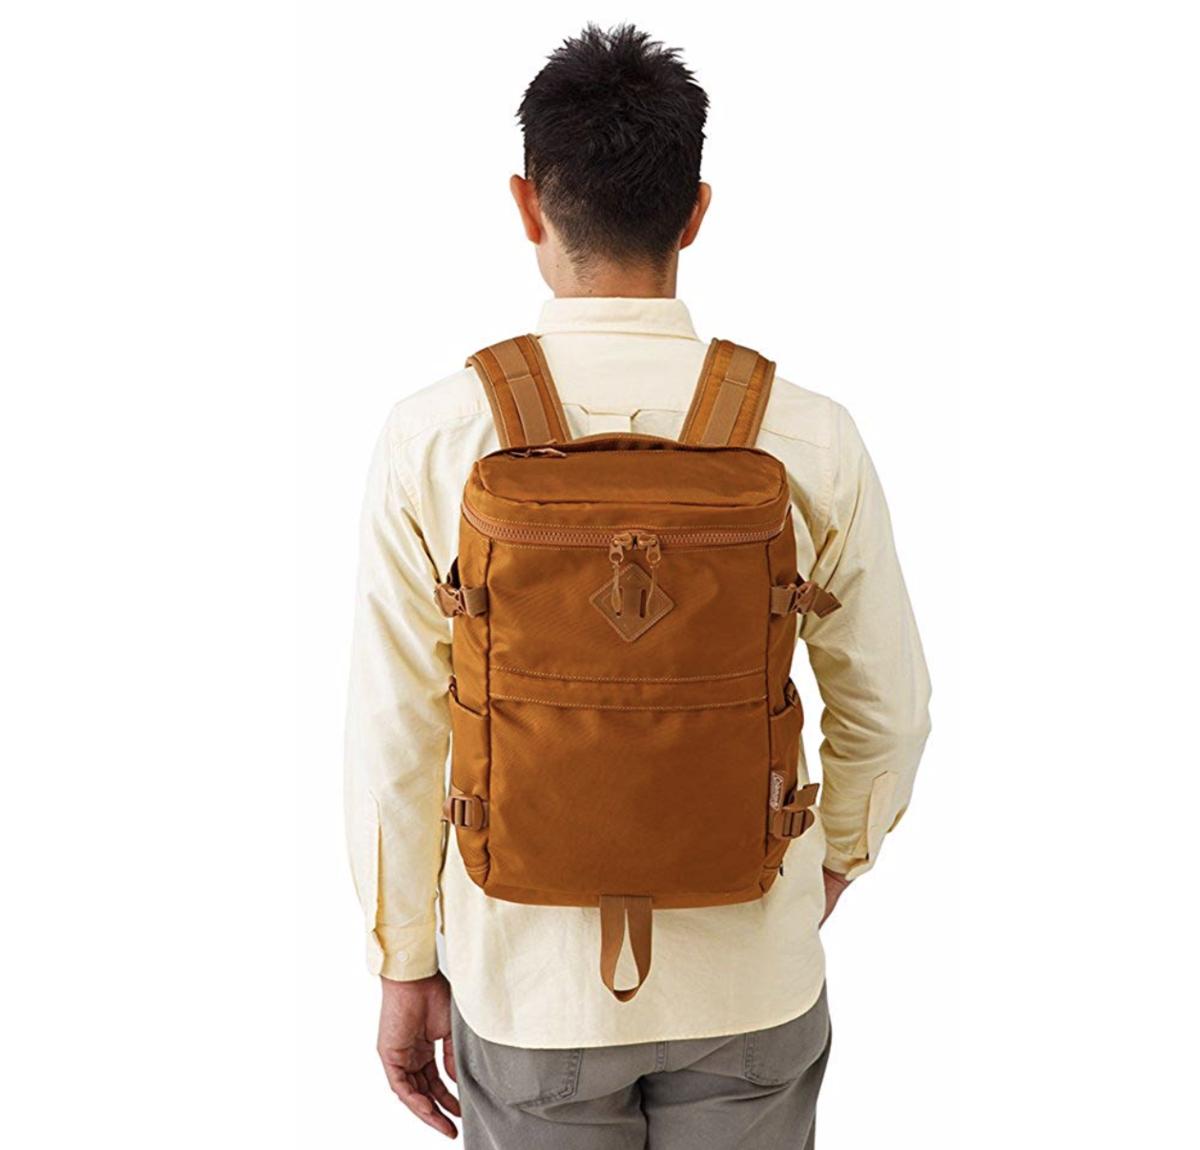 f:id:thebackpack:20190421191648p:plain